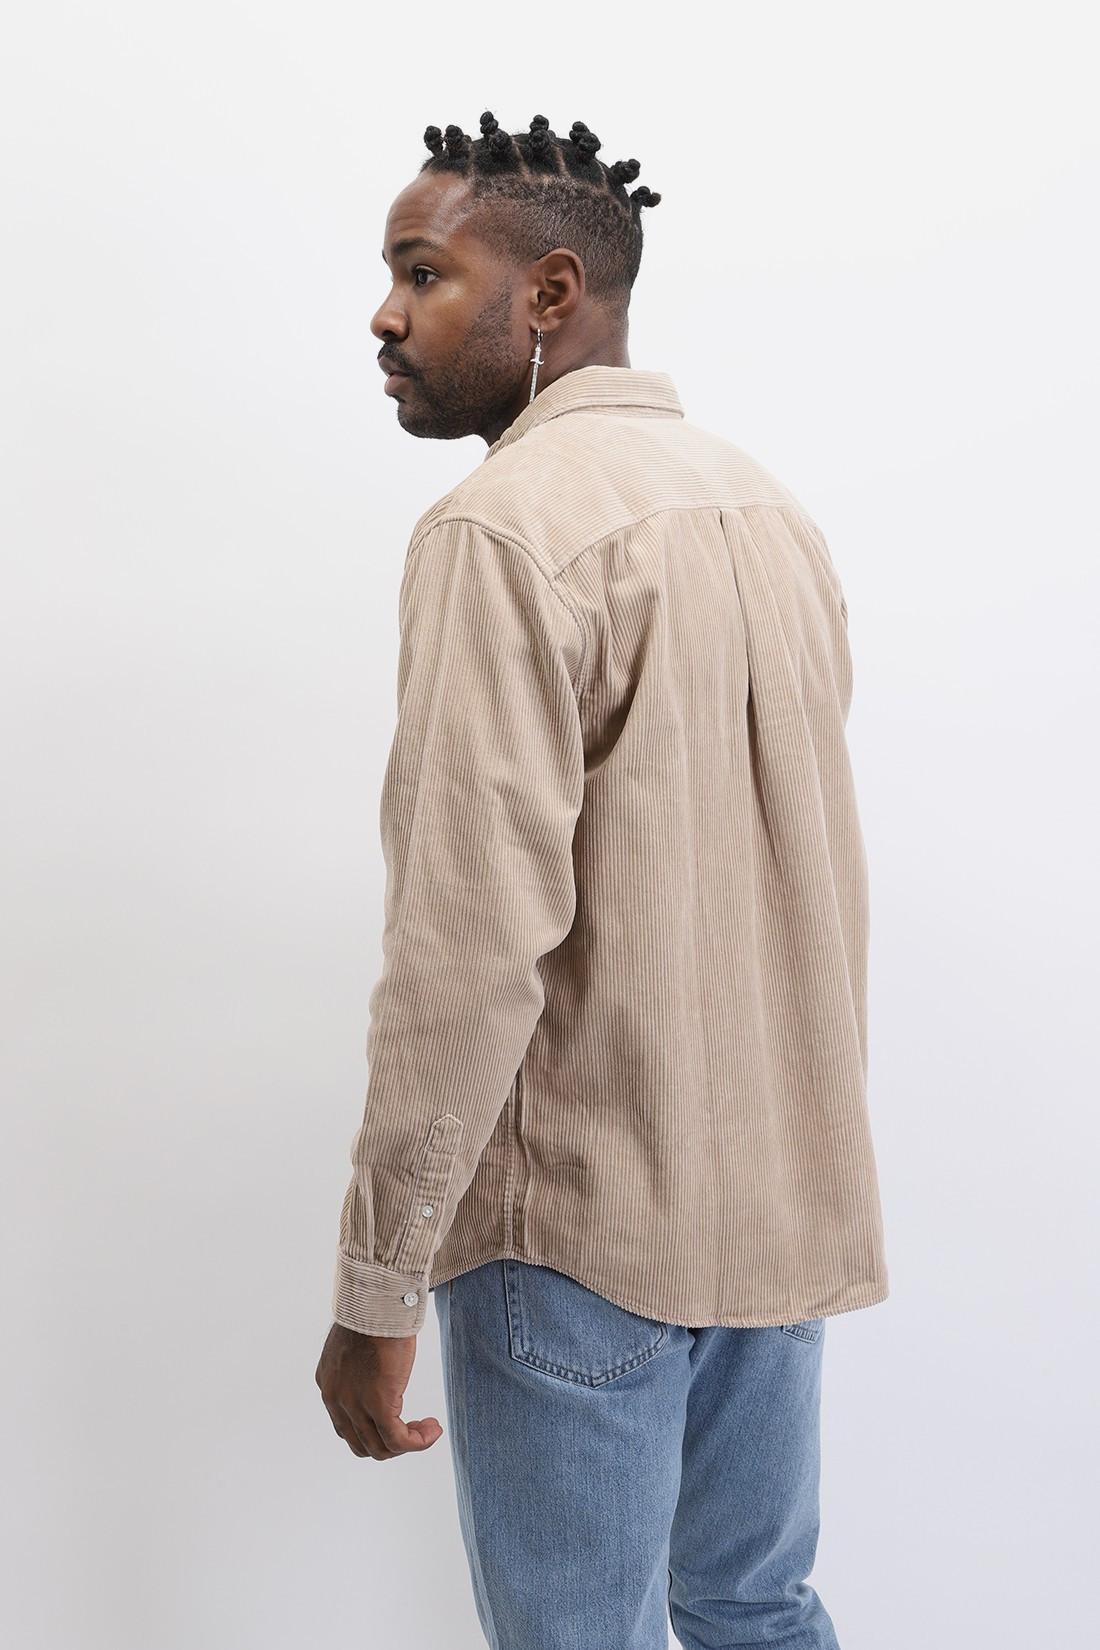 CARHARTT WIP / L/s madison cord shirt Wall